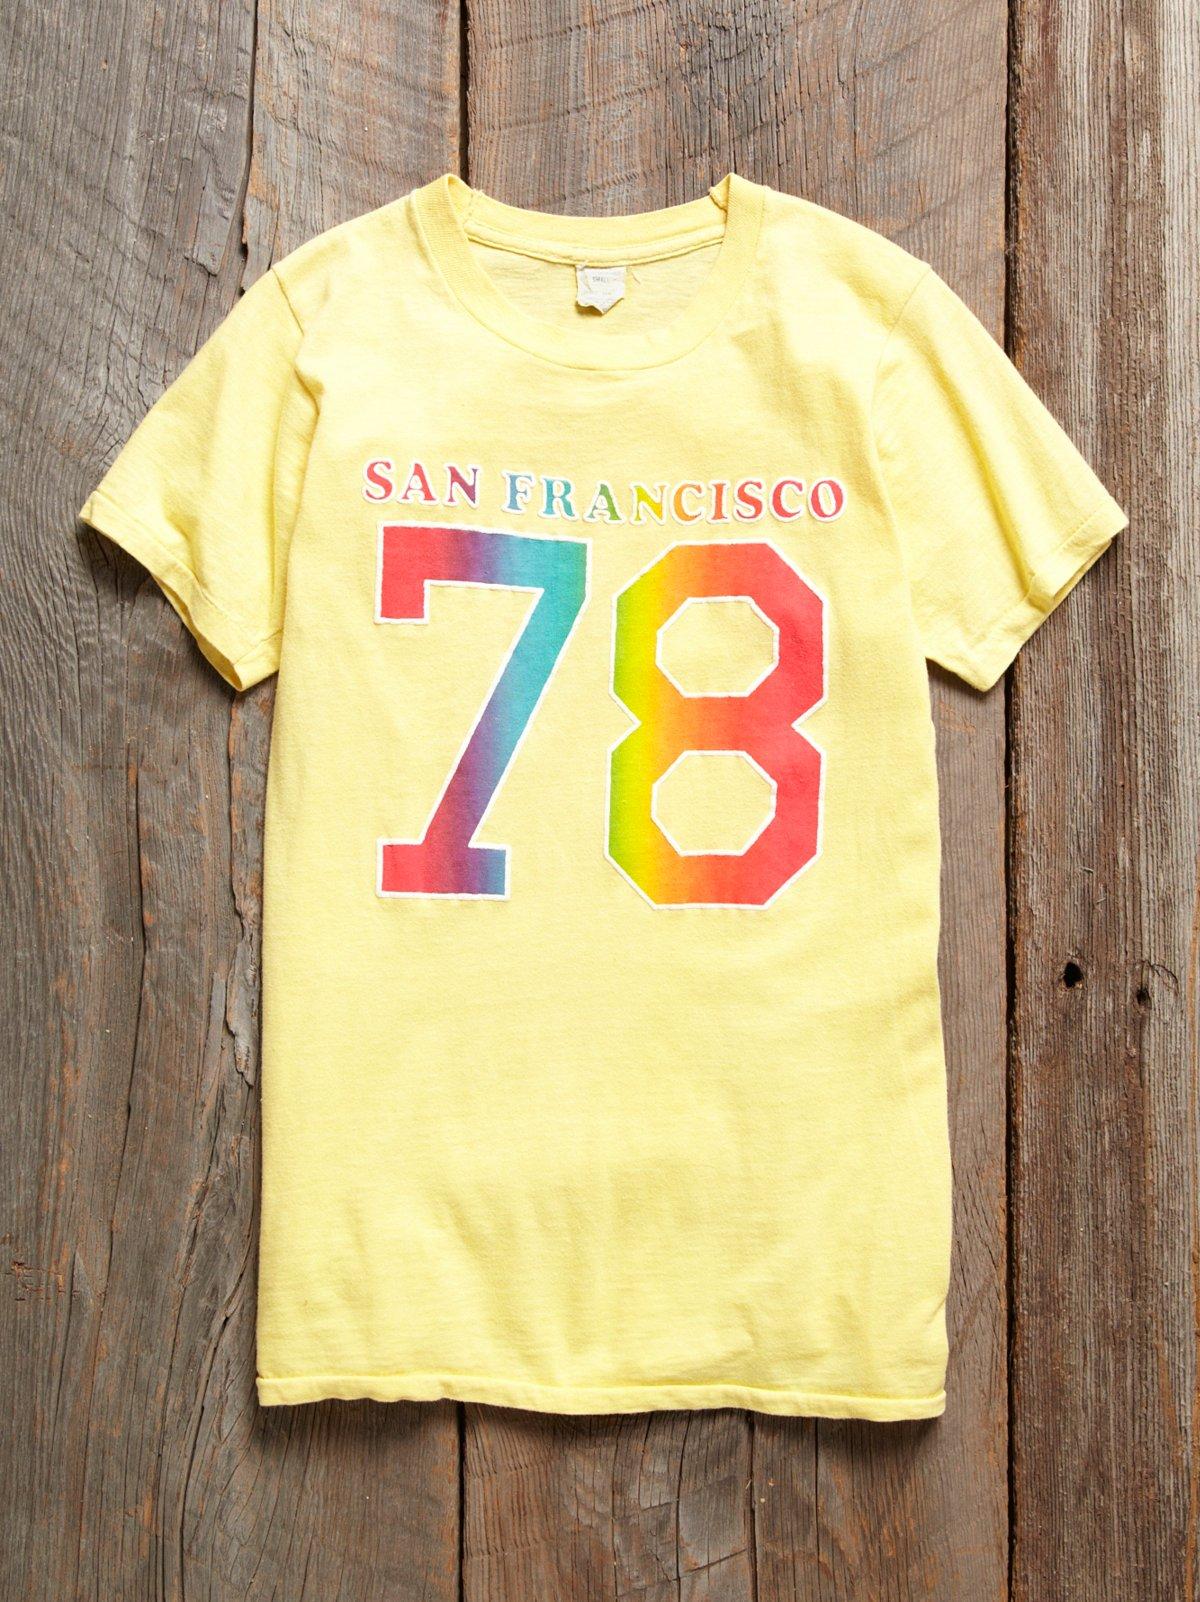 Vintage 1980s San Francisco T Shirt